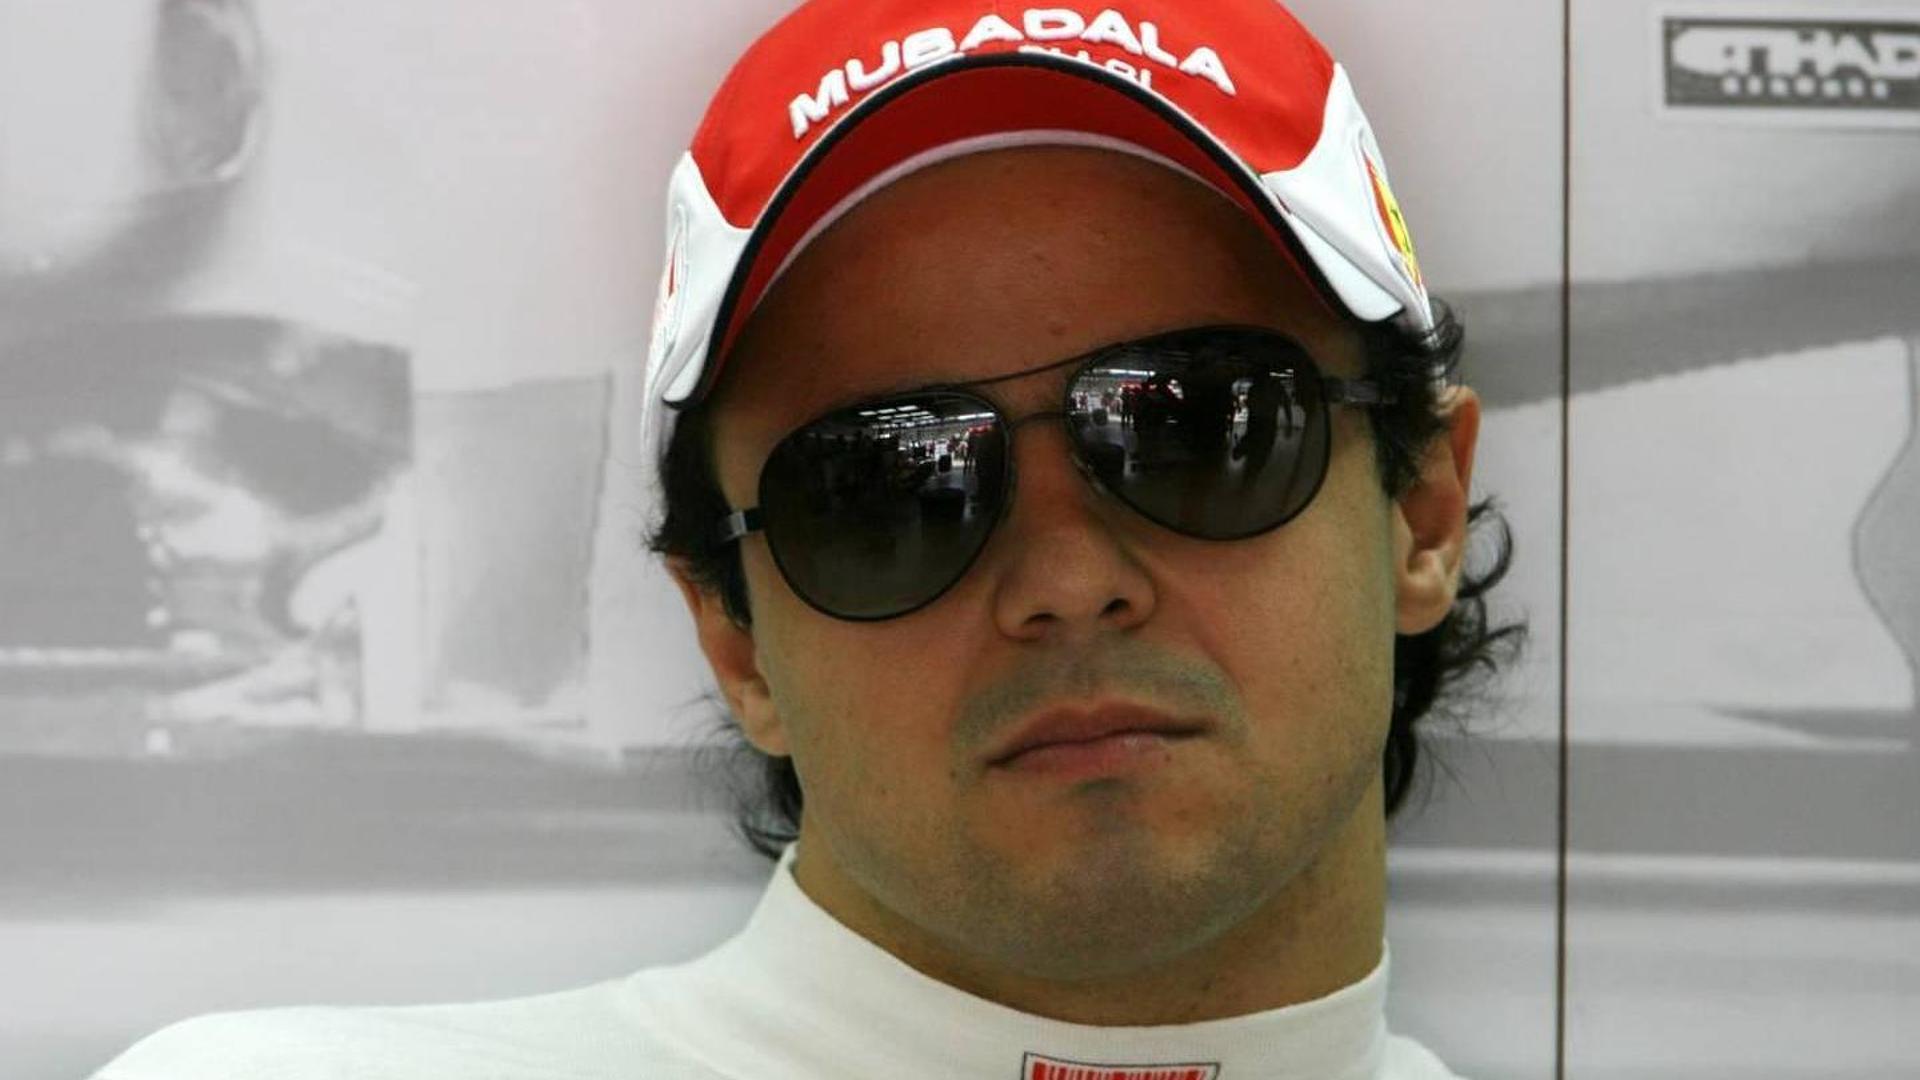 'Fear' doesn't explain Massa's decline - Kubica